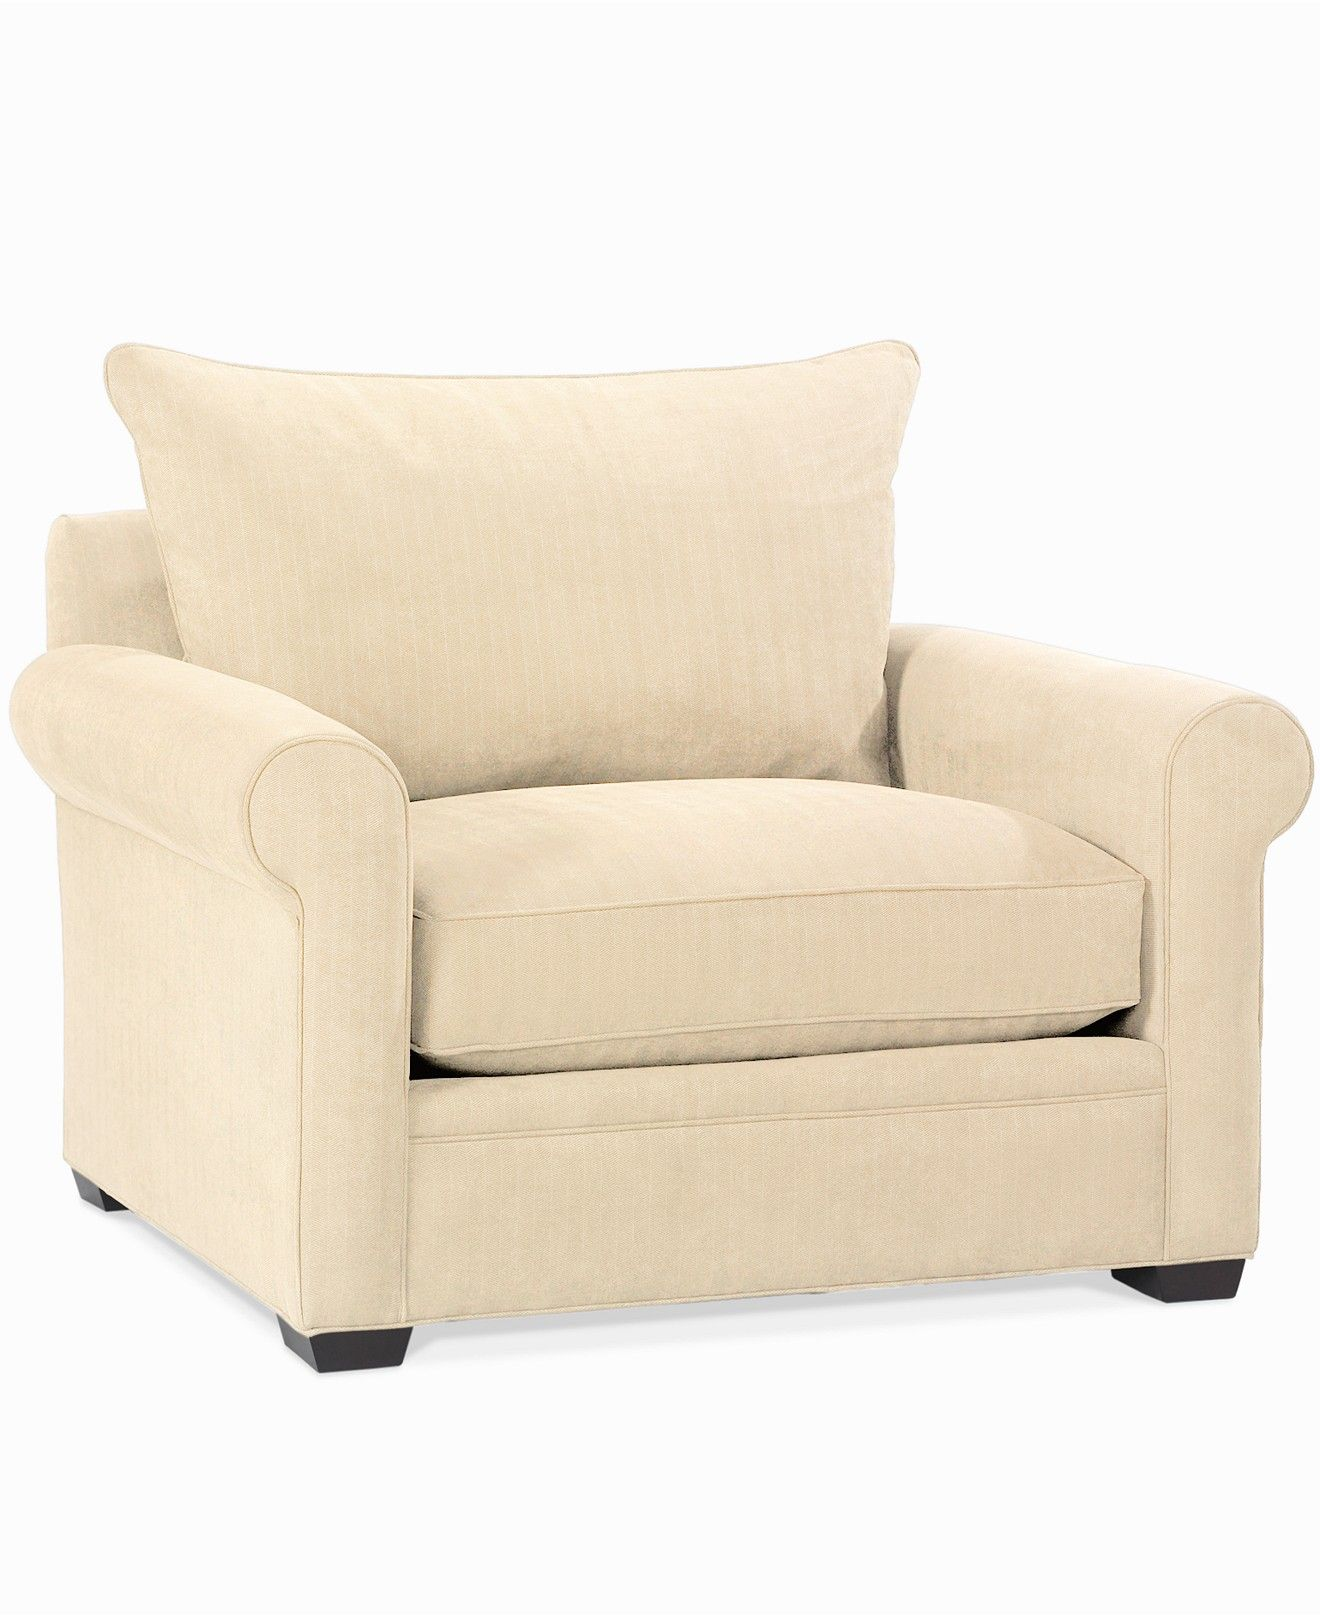 Dial Fabric Microfiber Living Room Chair: Custom Colors